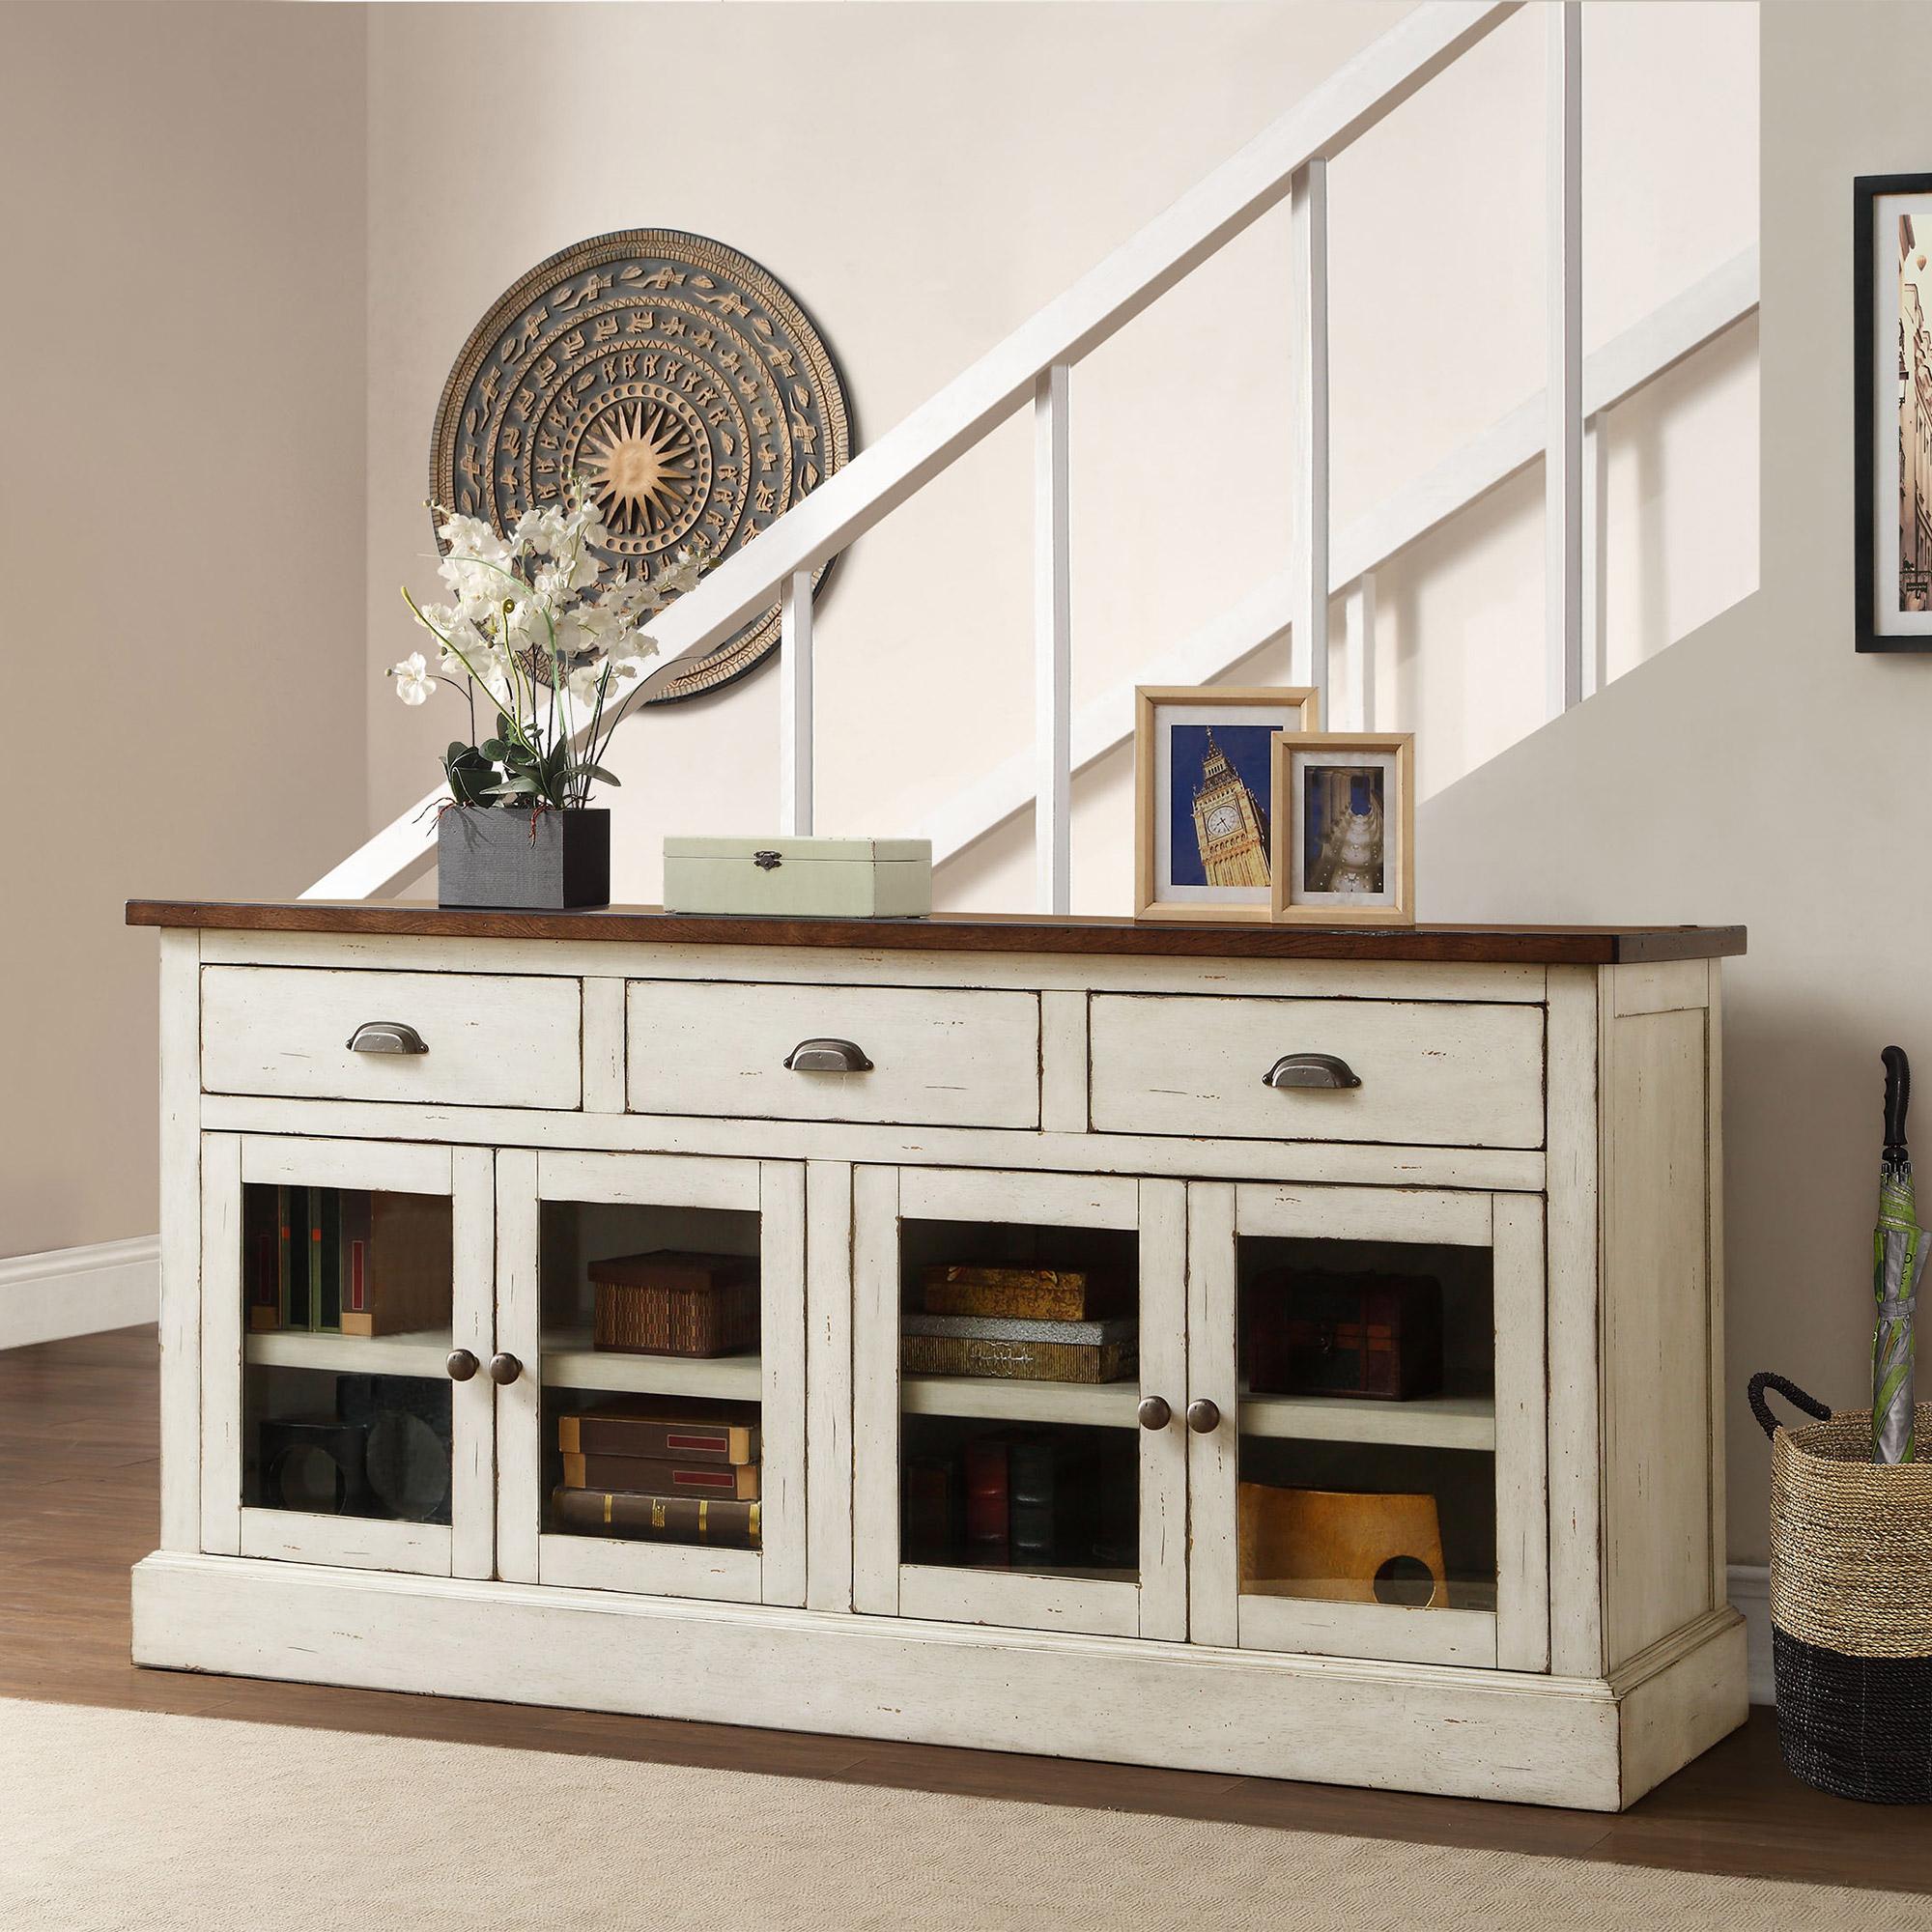 Furniture Furnishings: Bayside Furnishings